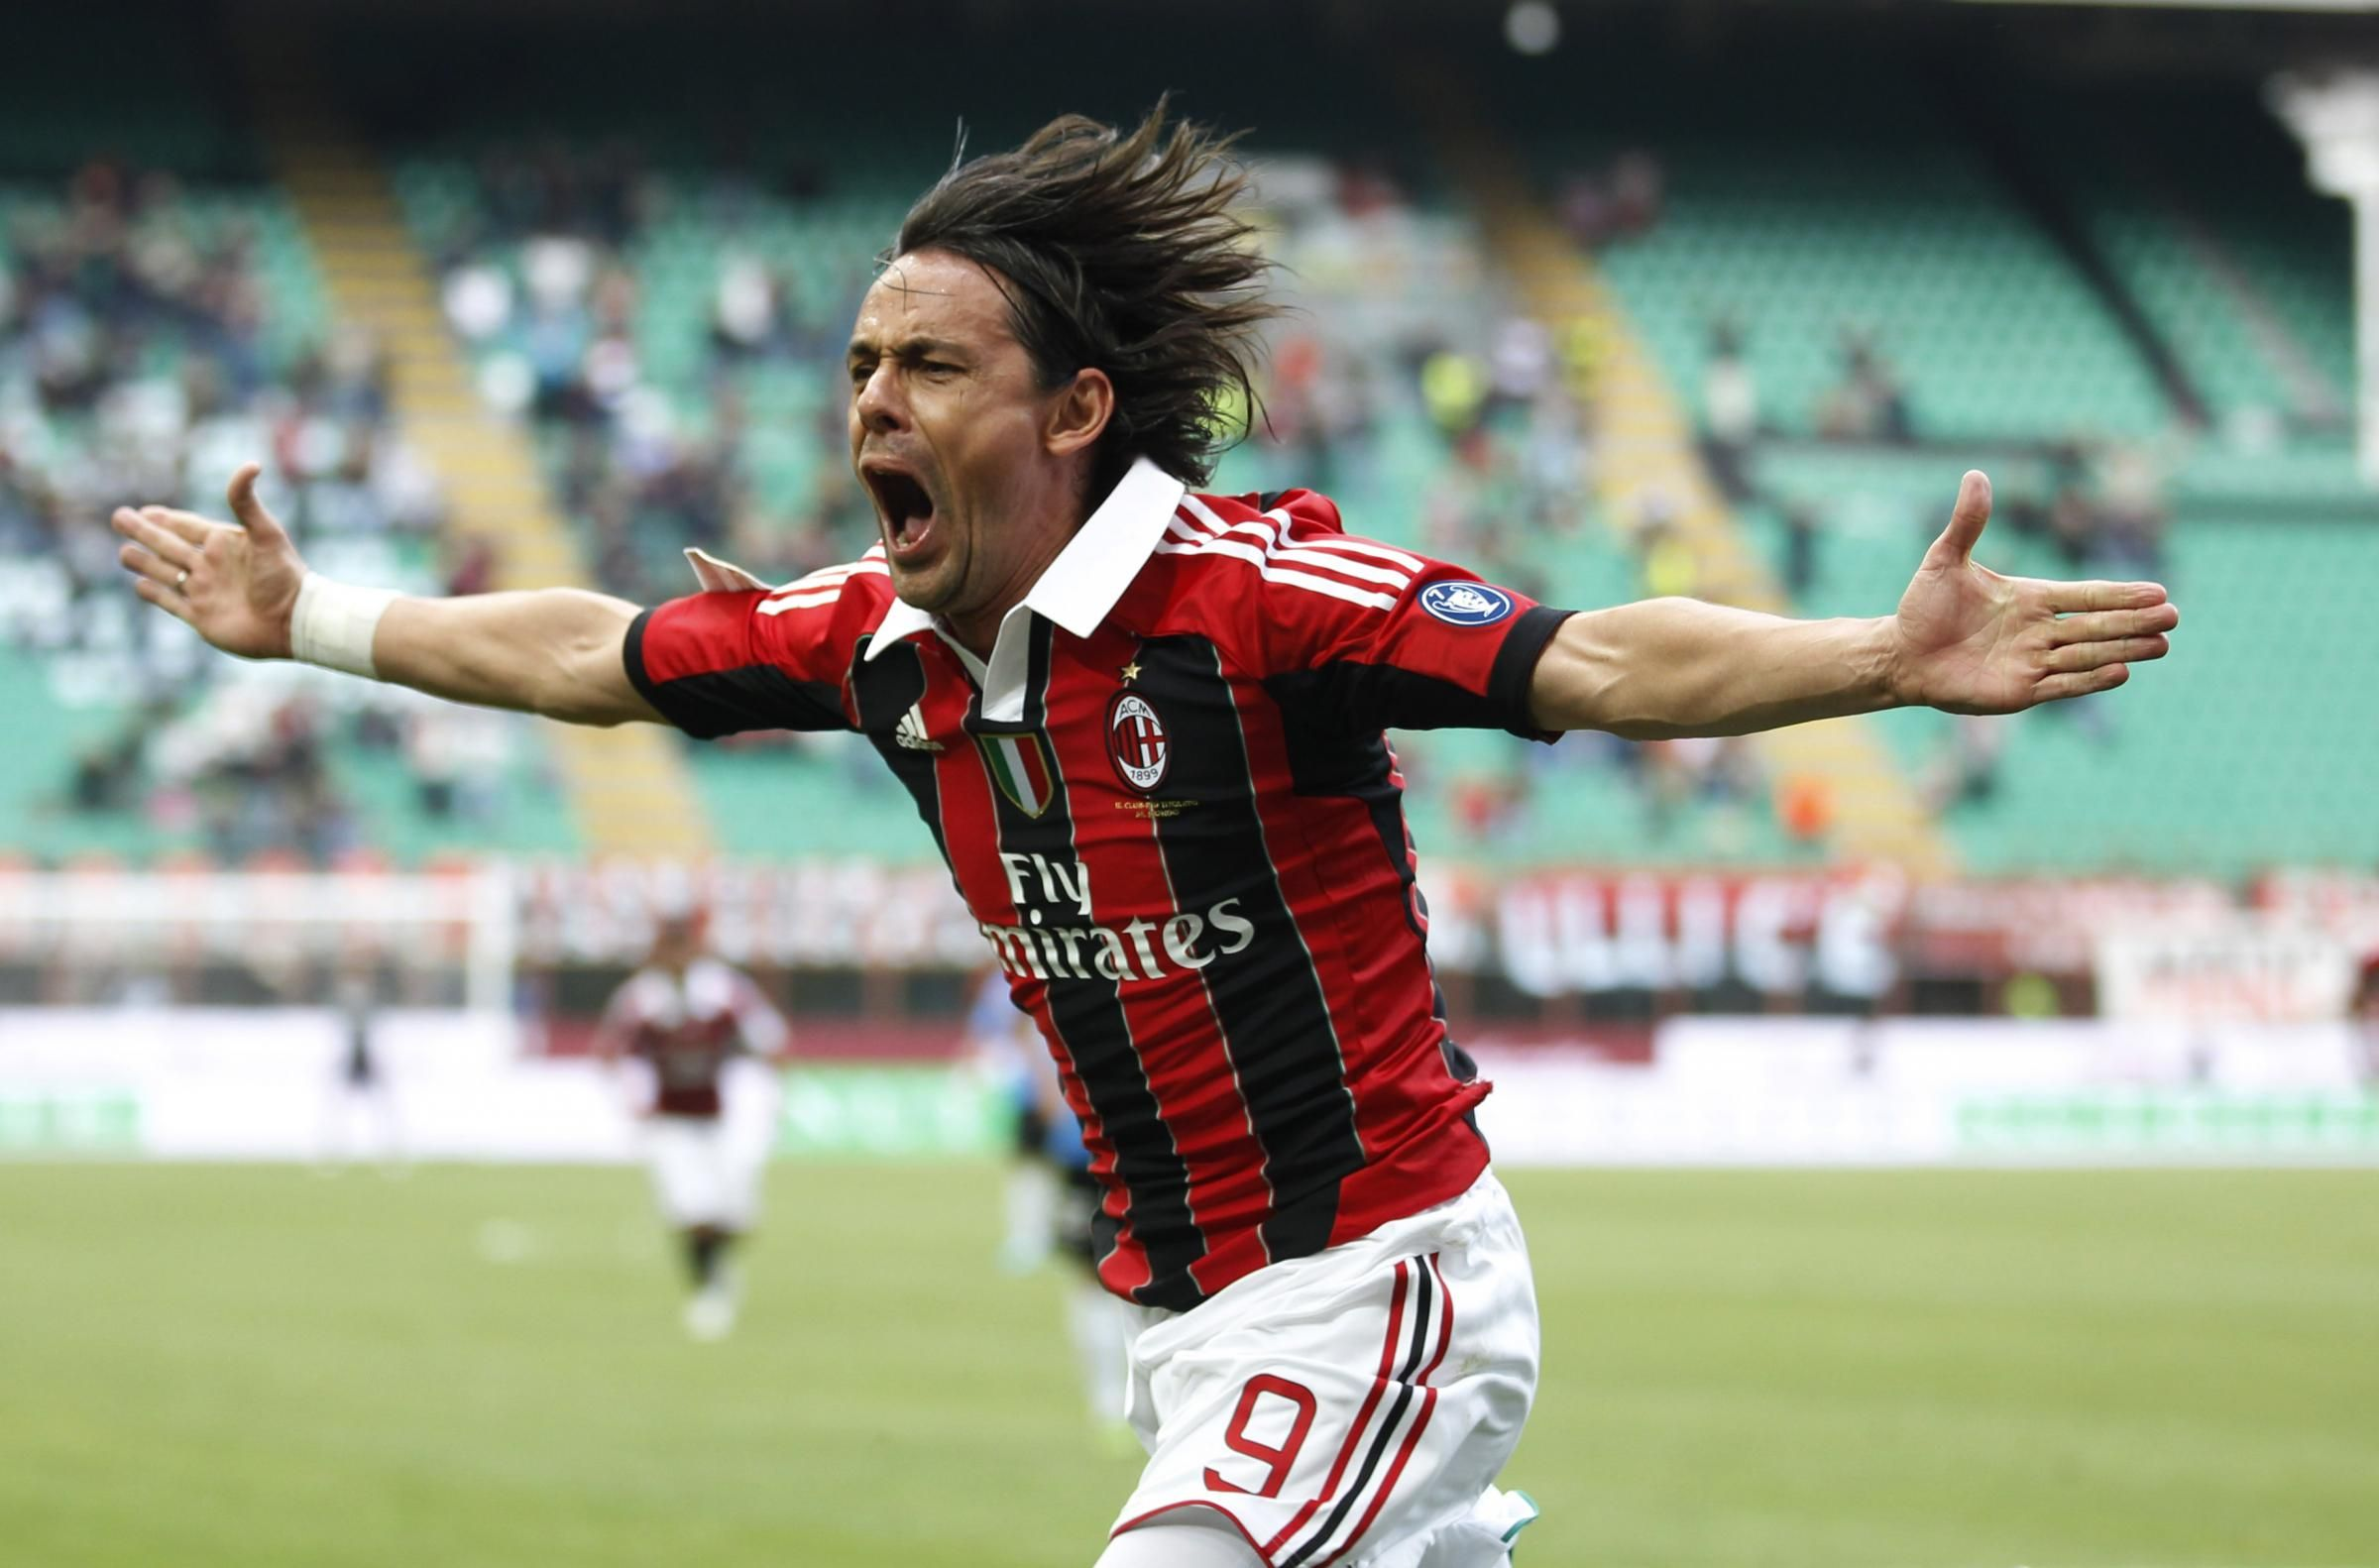 AC Milan forward Filippo Inzaghi celebrates after scoring during a